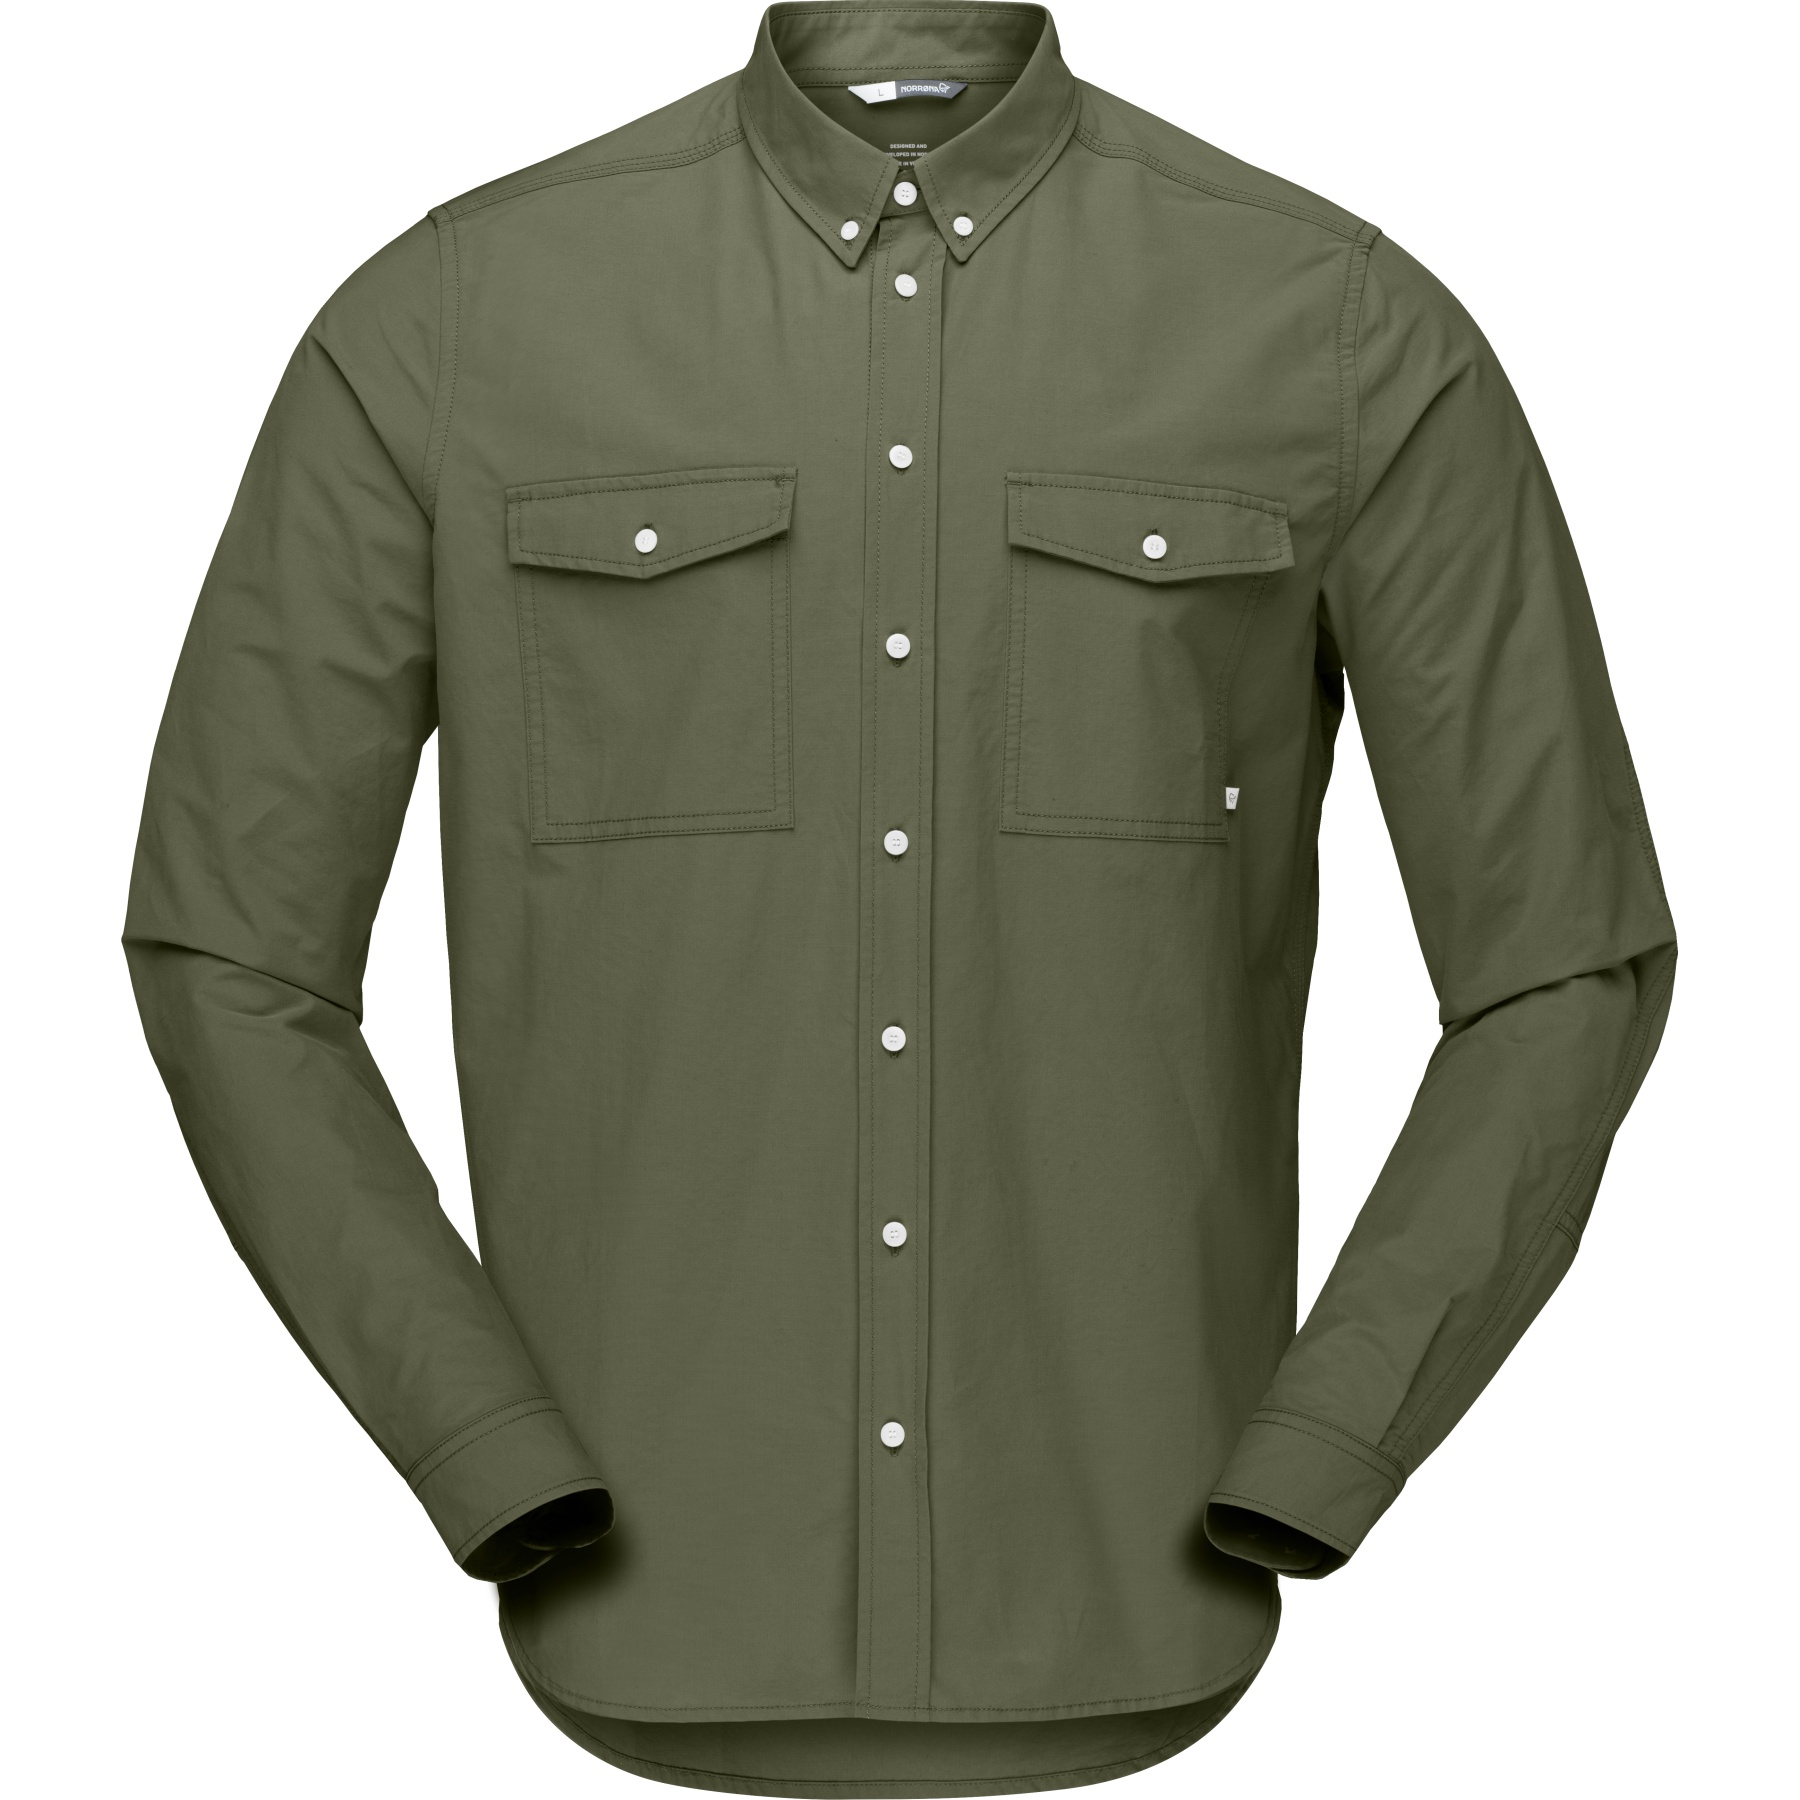 Norrona norrøna Shirt Men - Olive Night